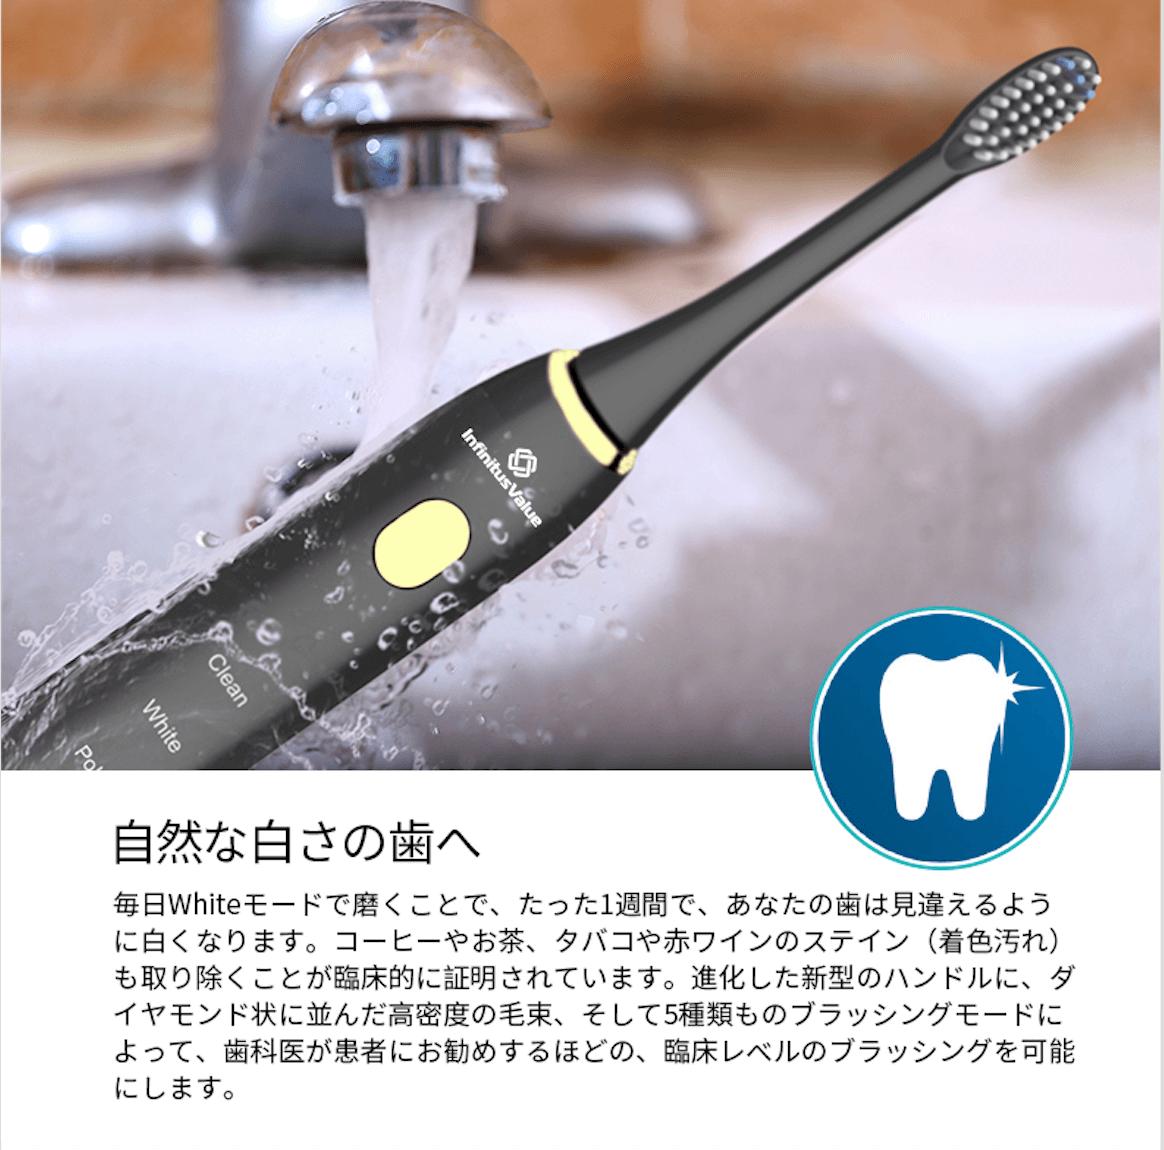 InfinitusValue スマートトラッキング電動歯ブラシ ホワイト IVHB01W